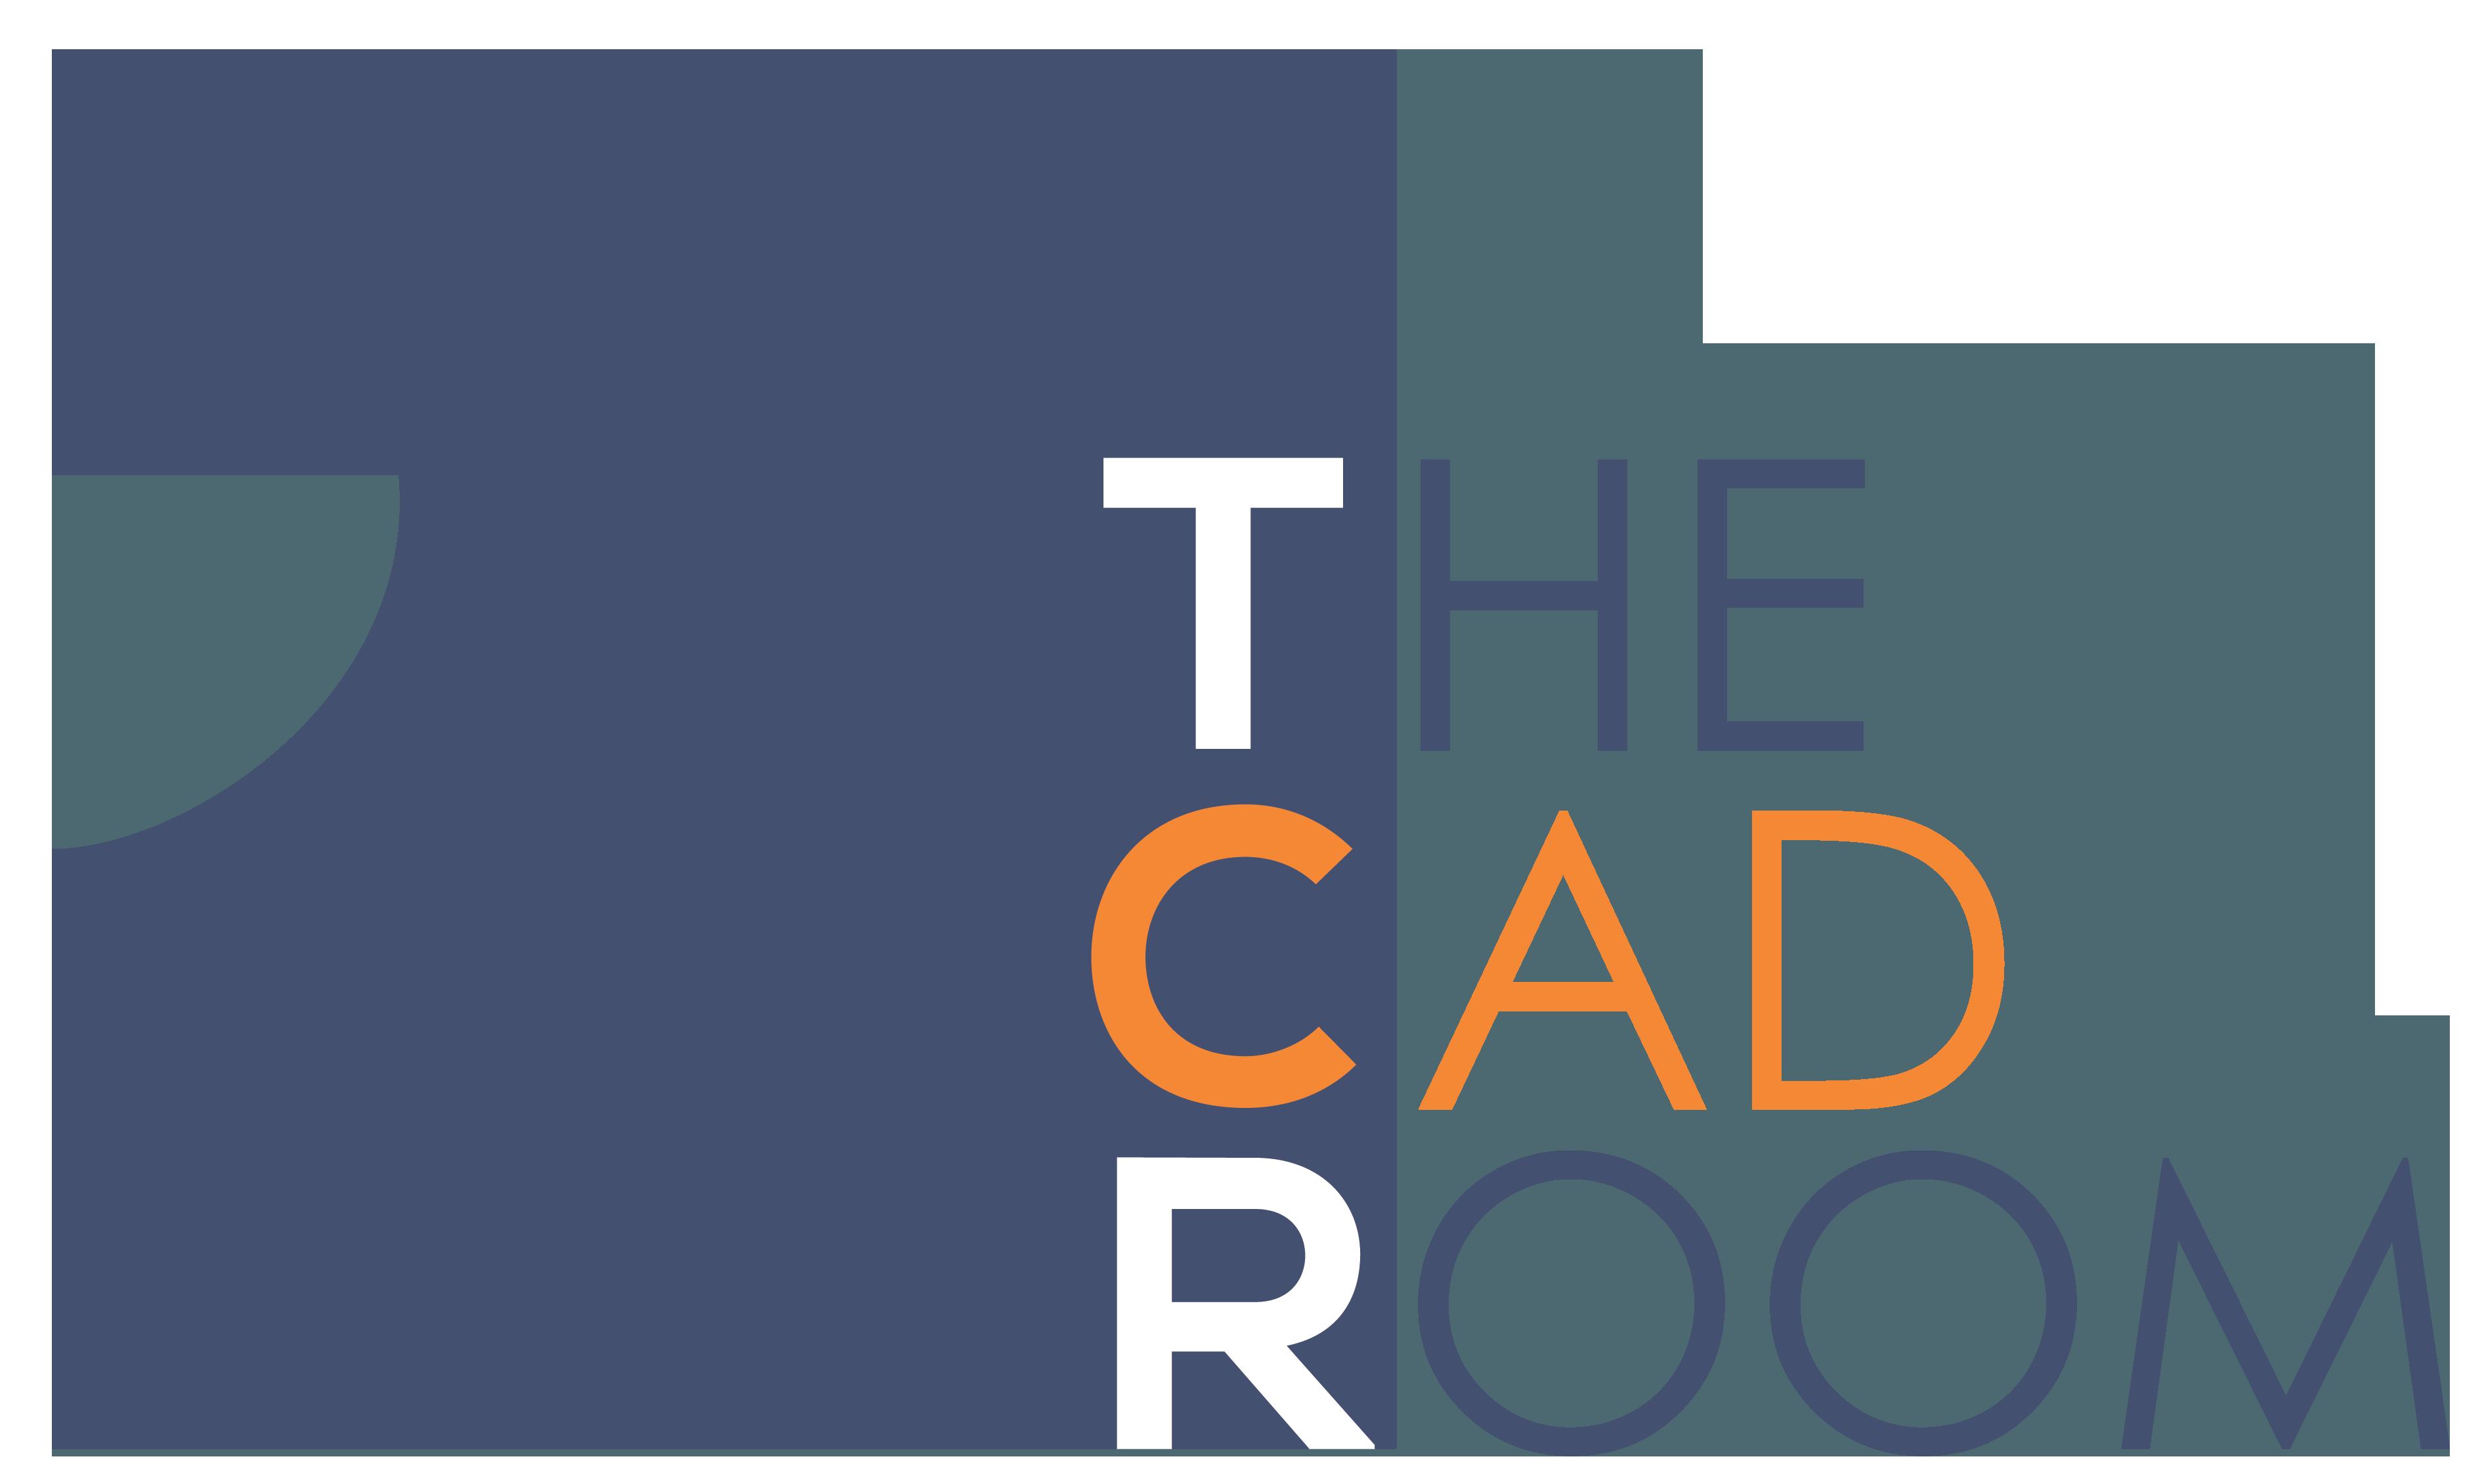 The CAD Room logo